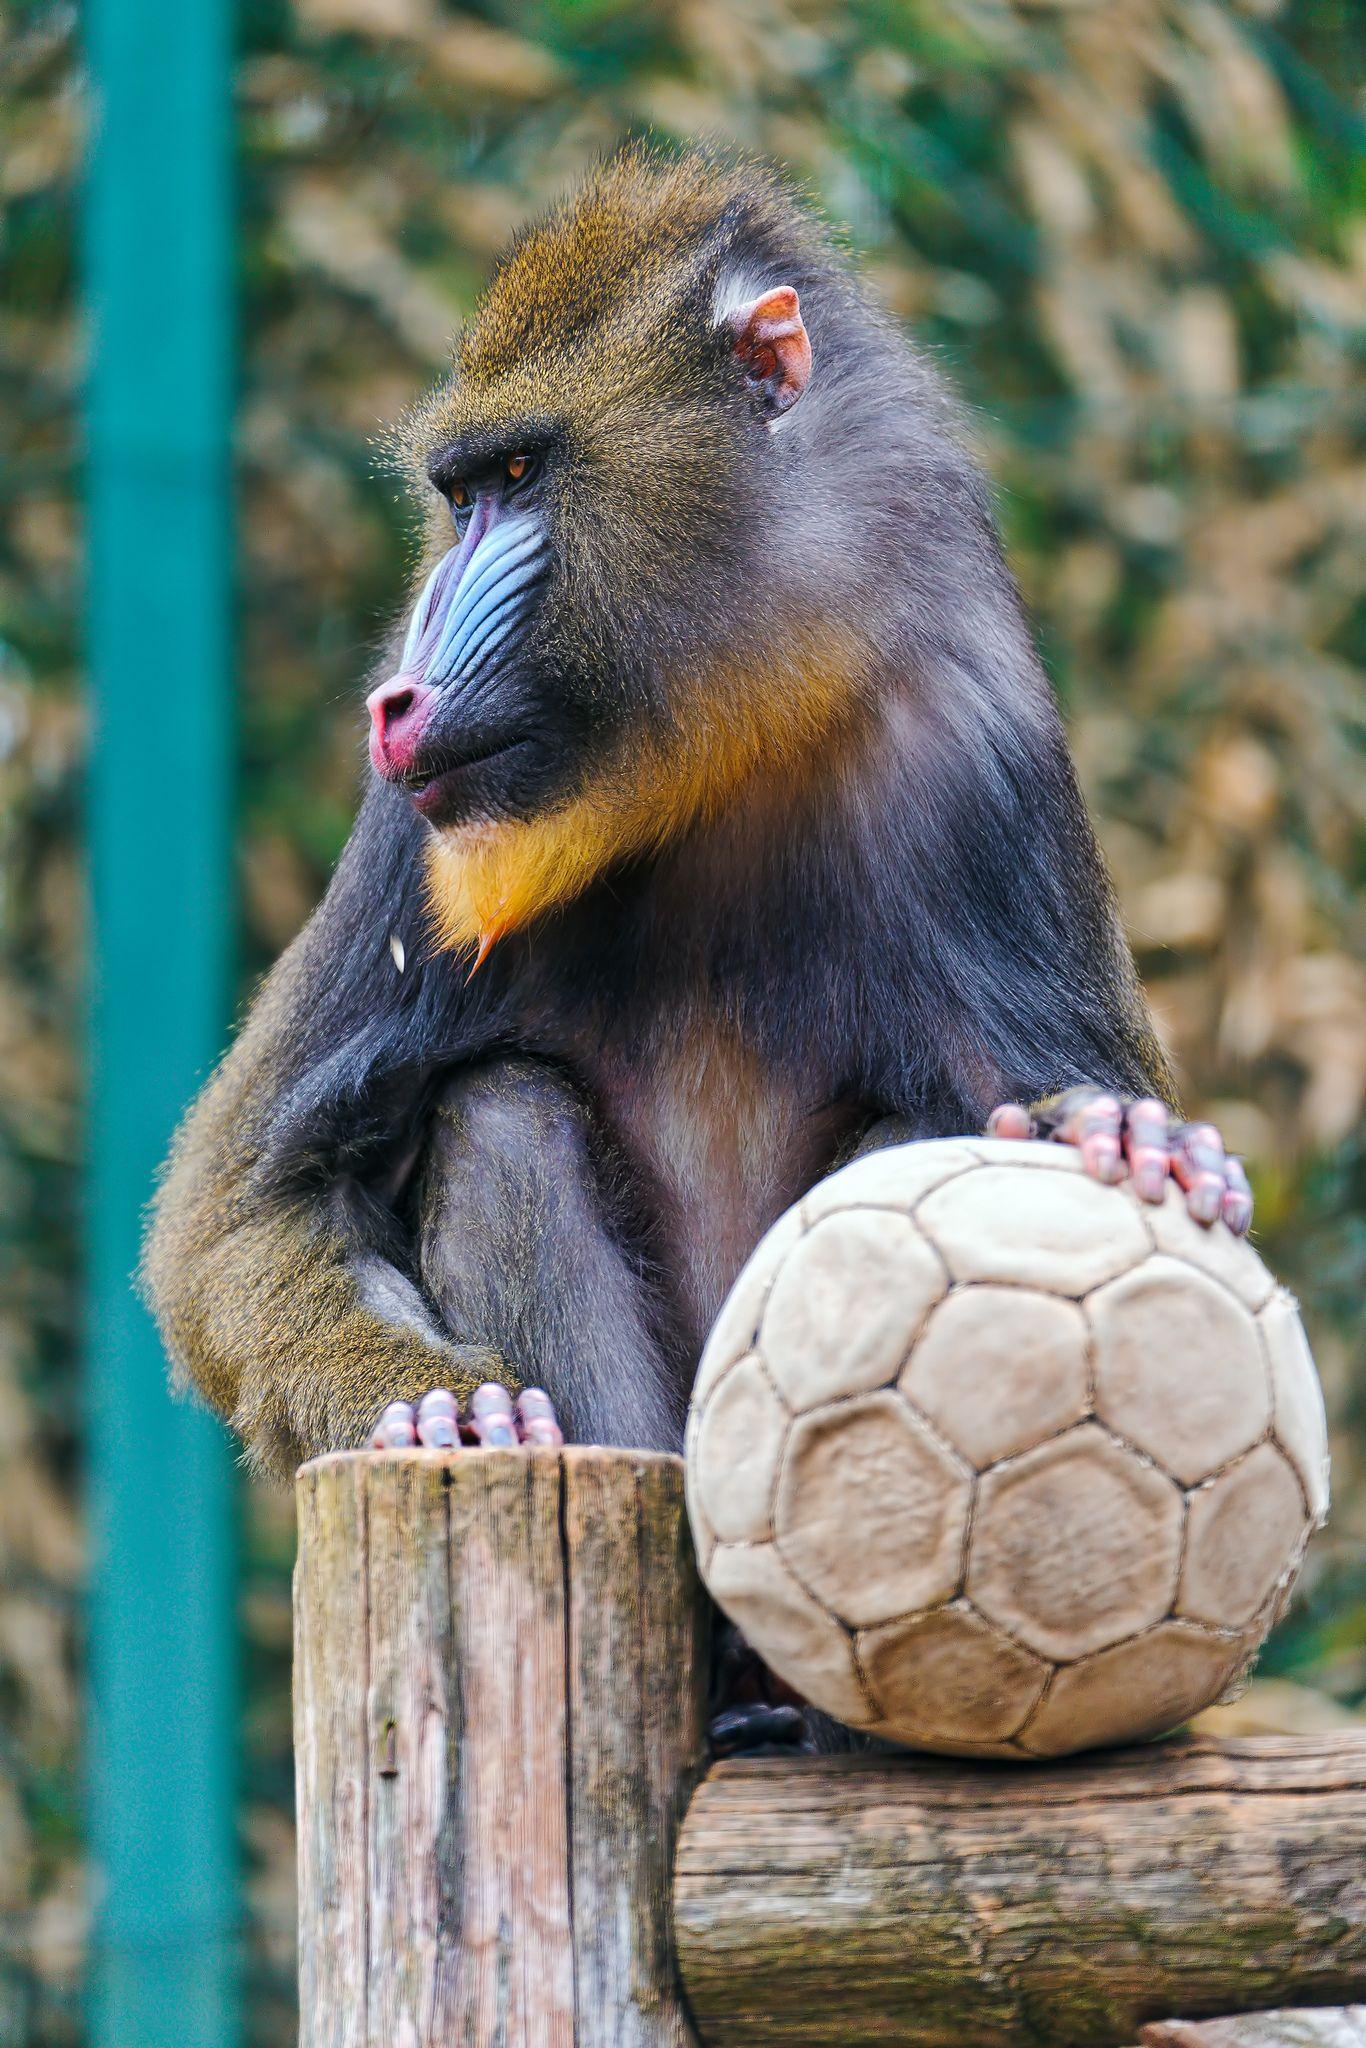 Monkey posing photo